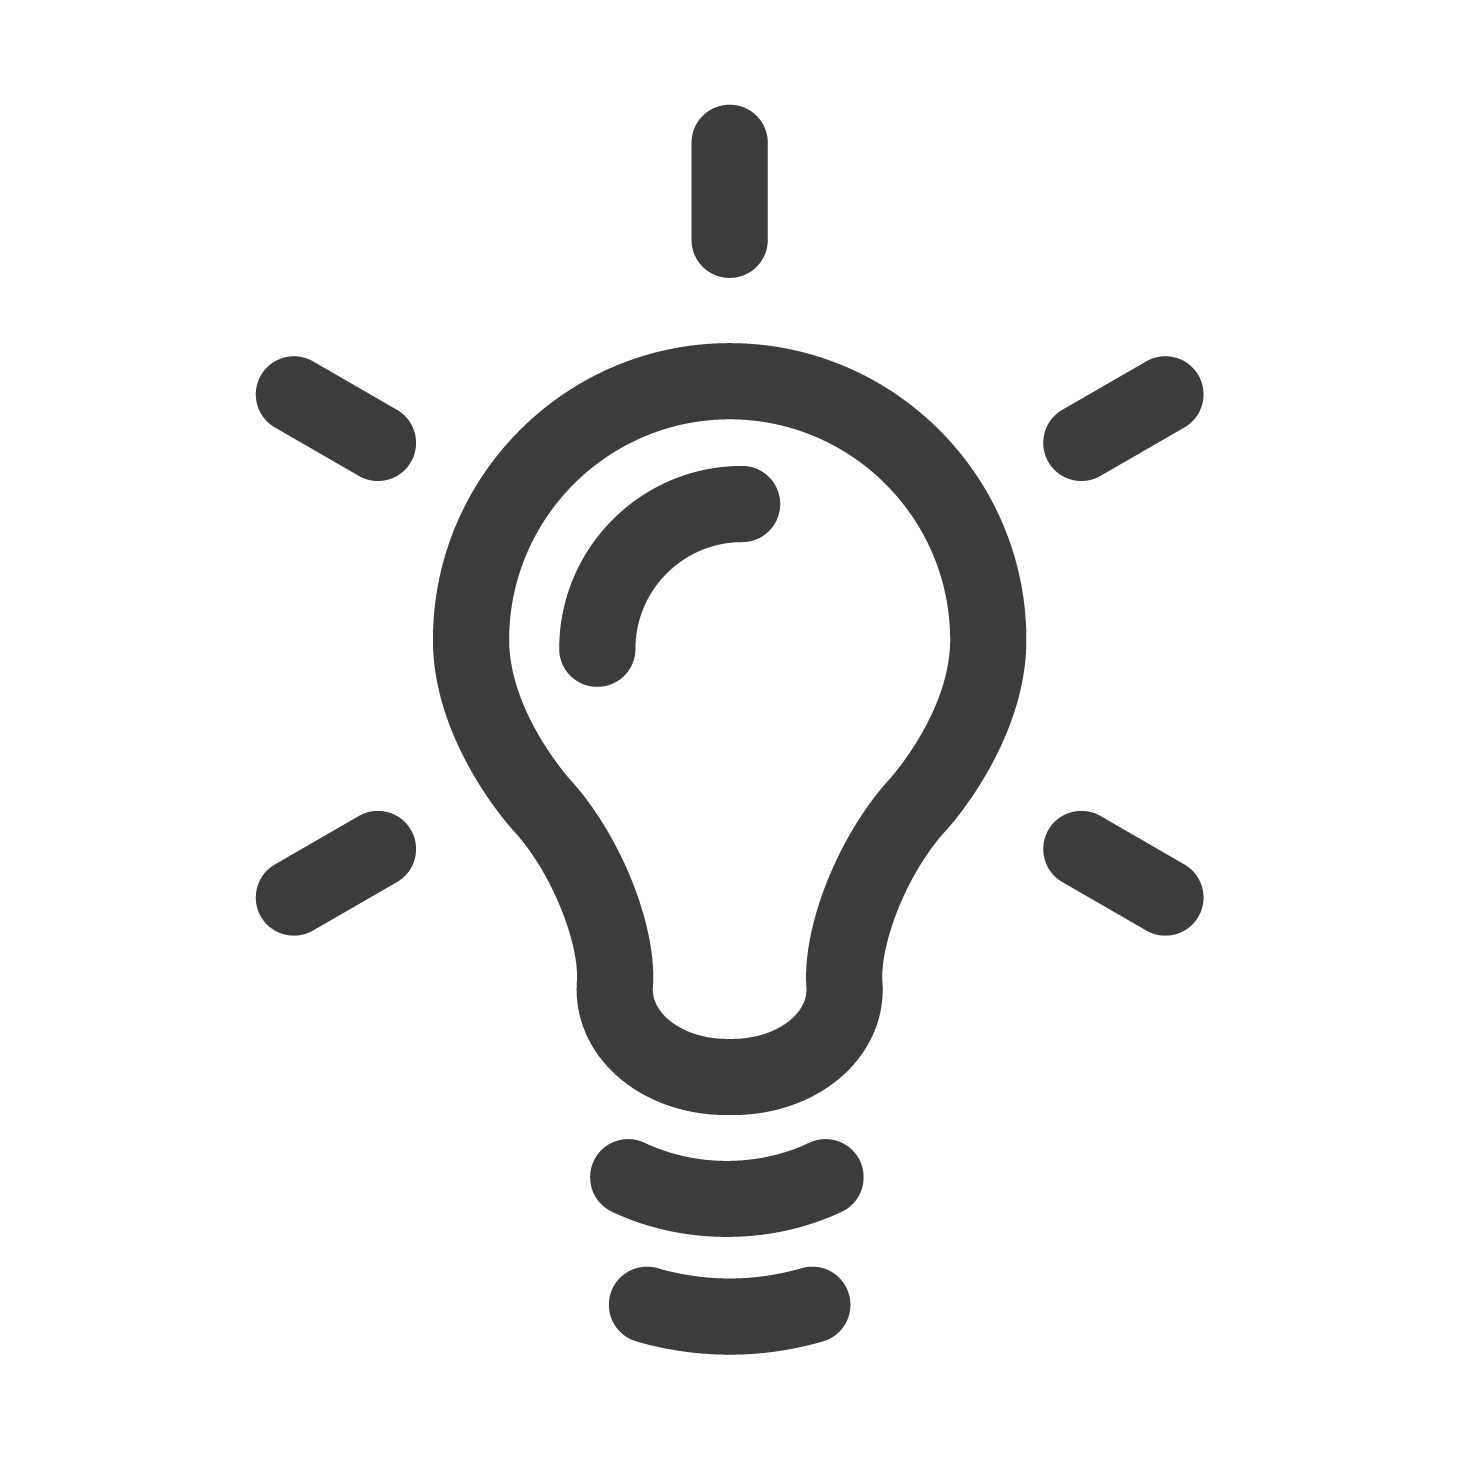 Glübhirne Icon